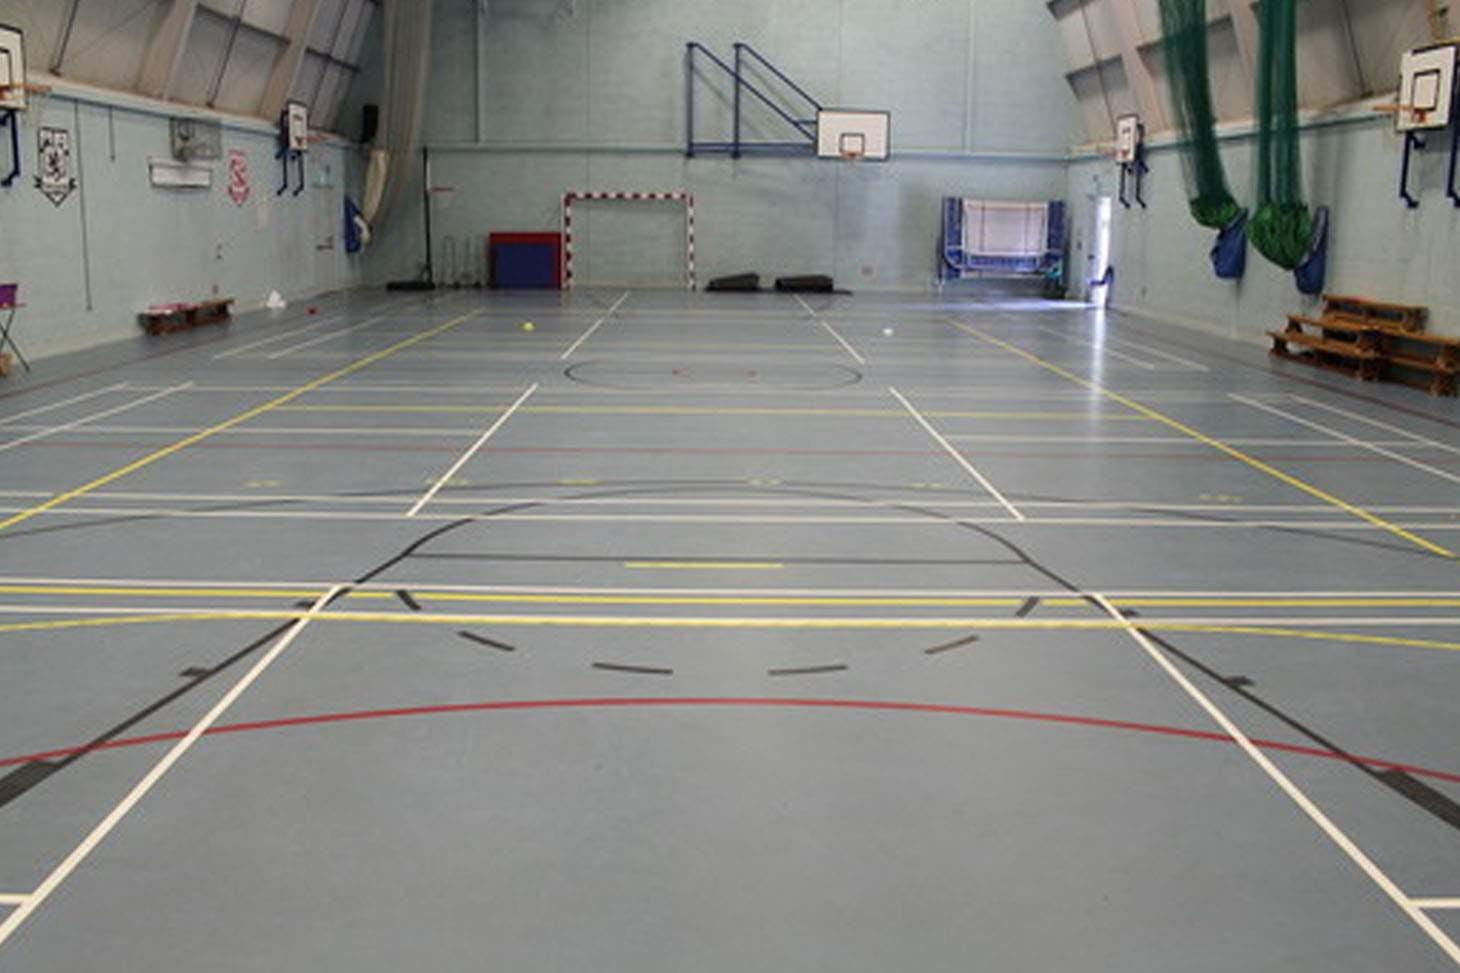 St Edmund Campion Catholic School & Sixth Form Centre Indoor badminton court